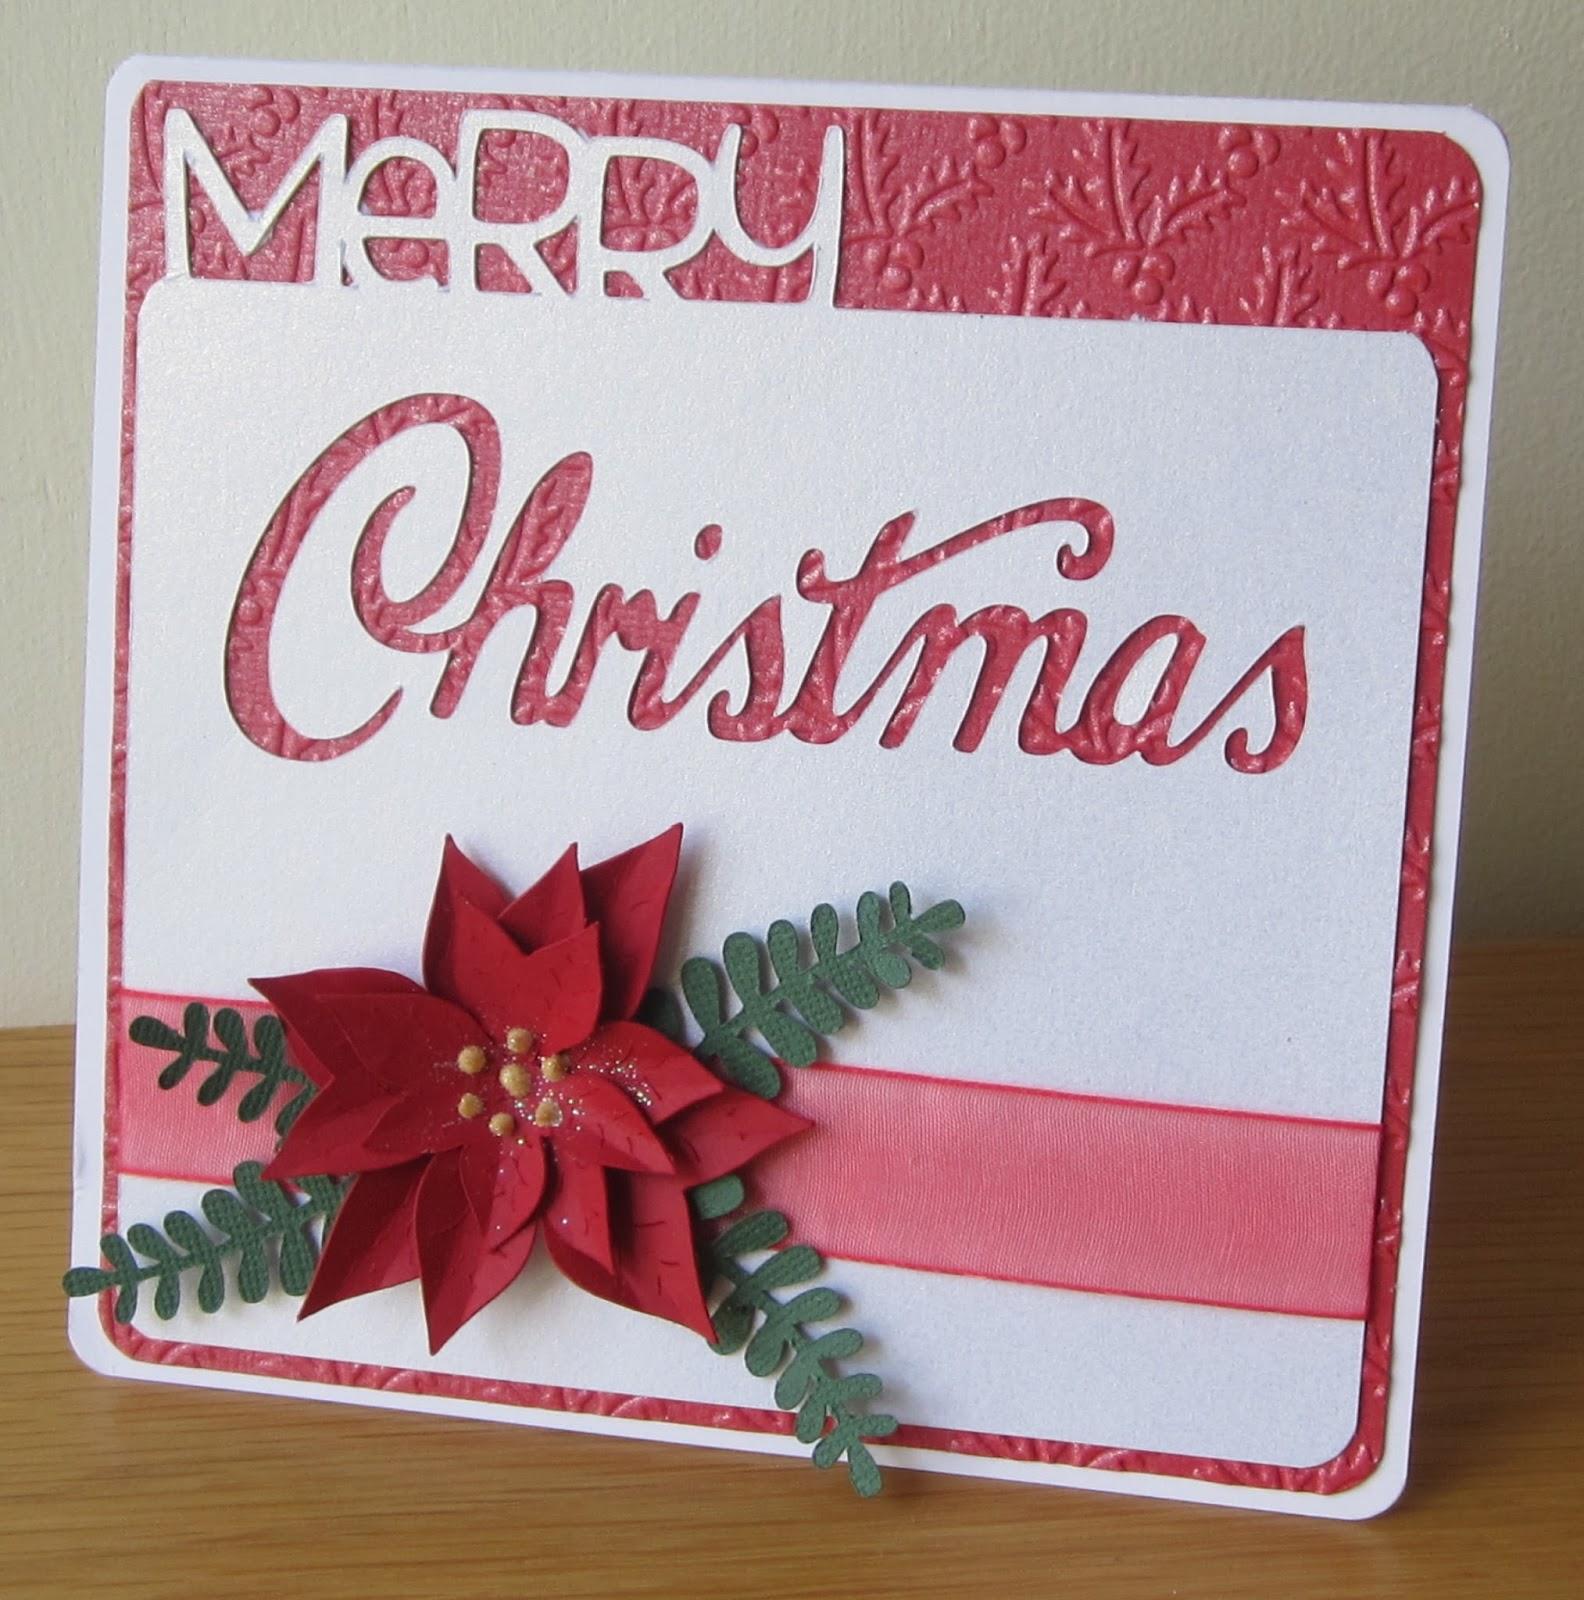 Must Buy Christmas Gifts for Teachers - Christmas ...